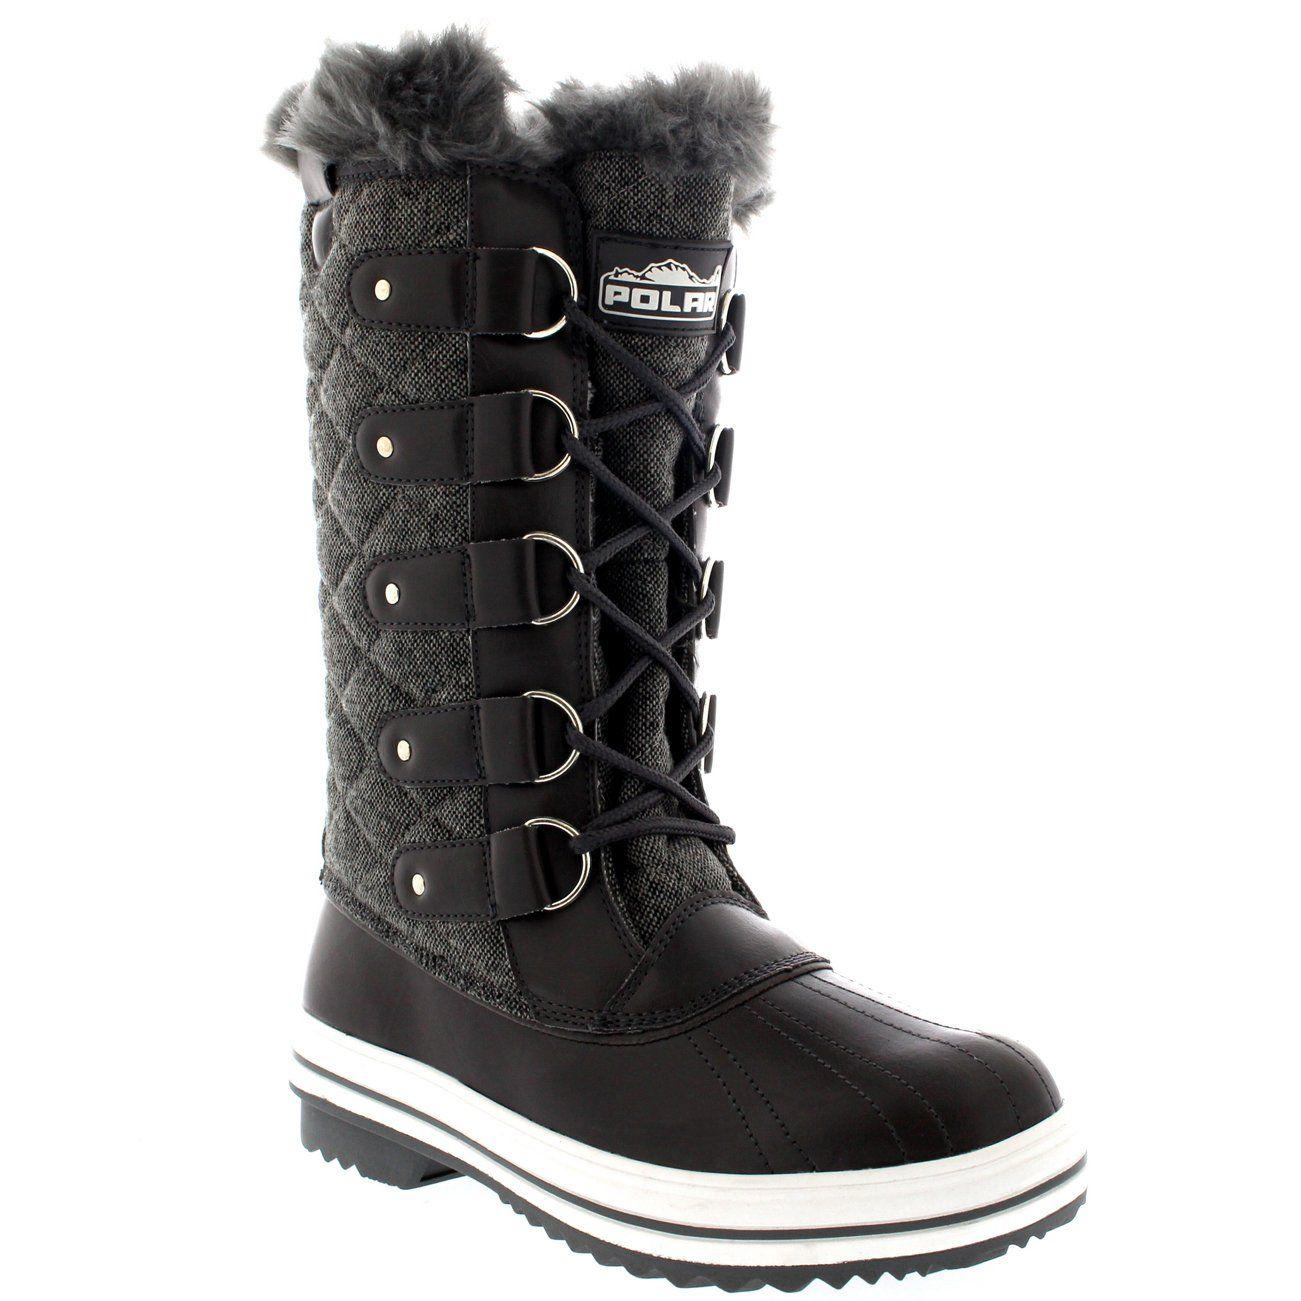 Women's Fashion Snow Boots Fur Lining Rain Footwear